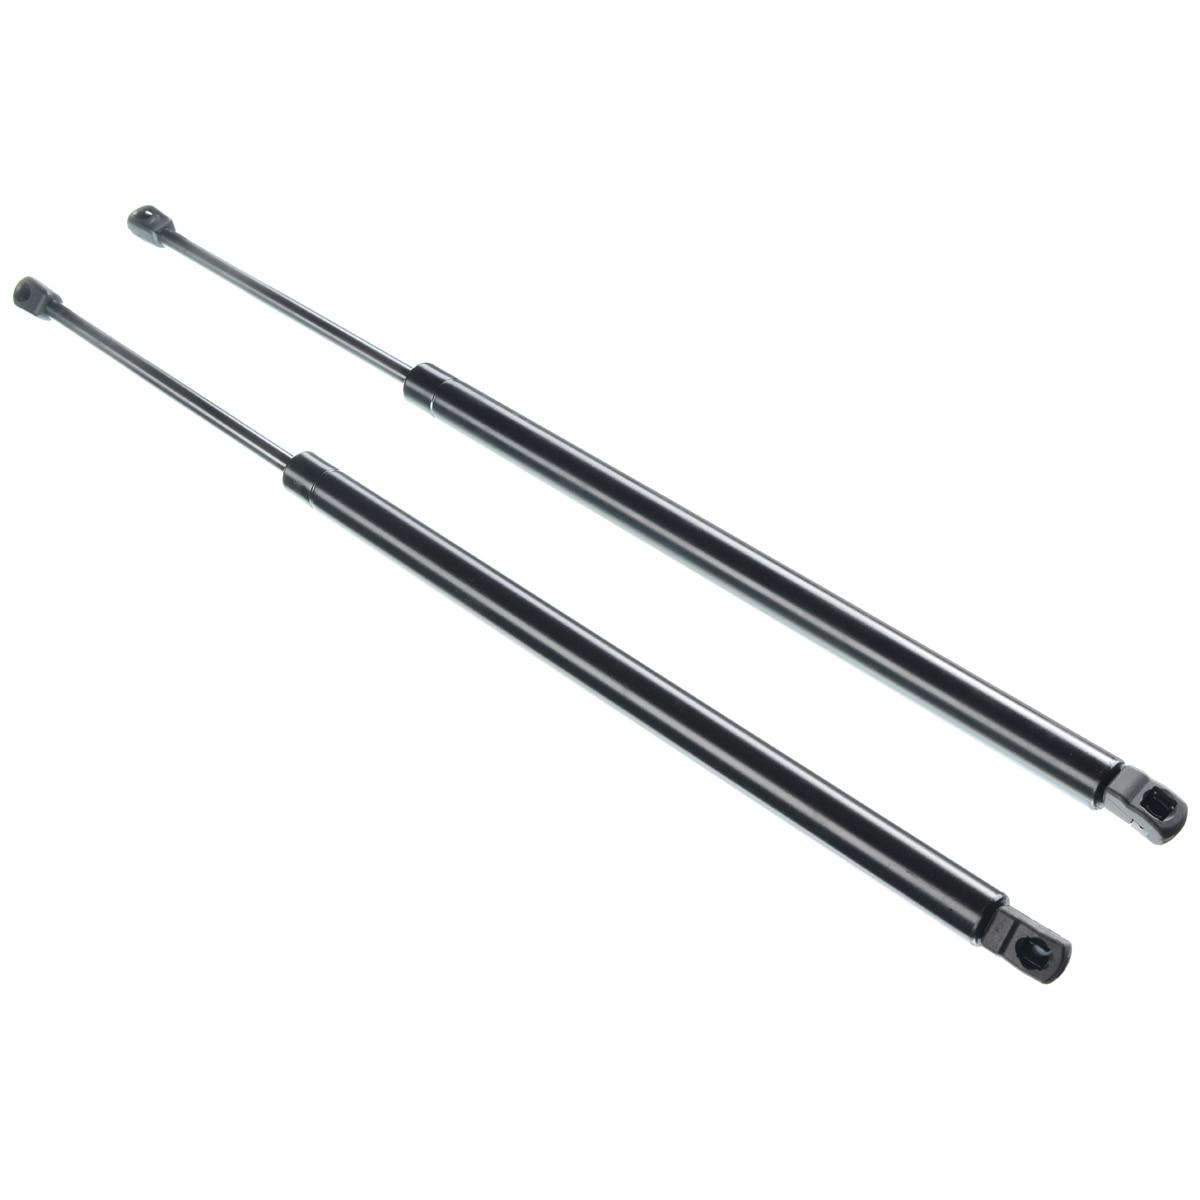 2x Rear Hatch Tailgate Lift Support Shock Struts for Honda CR-V 2007-2011 6179